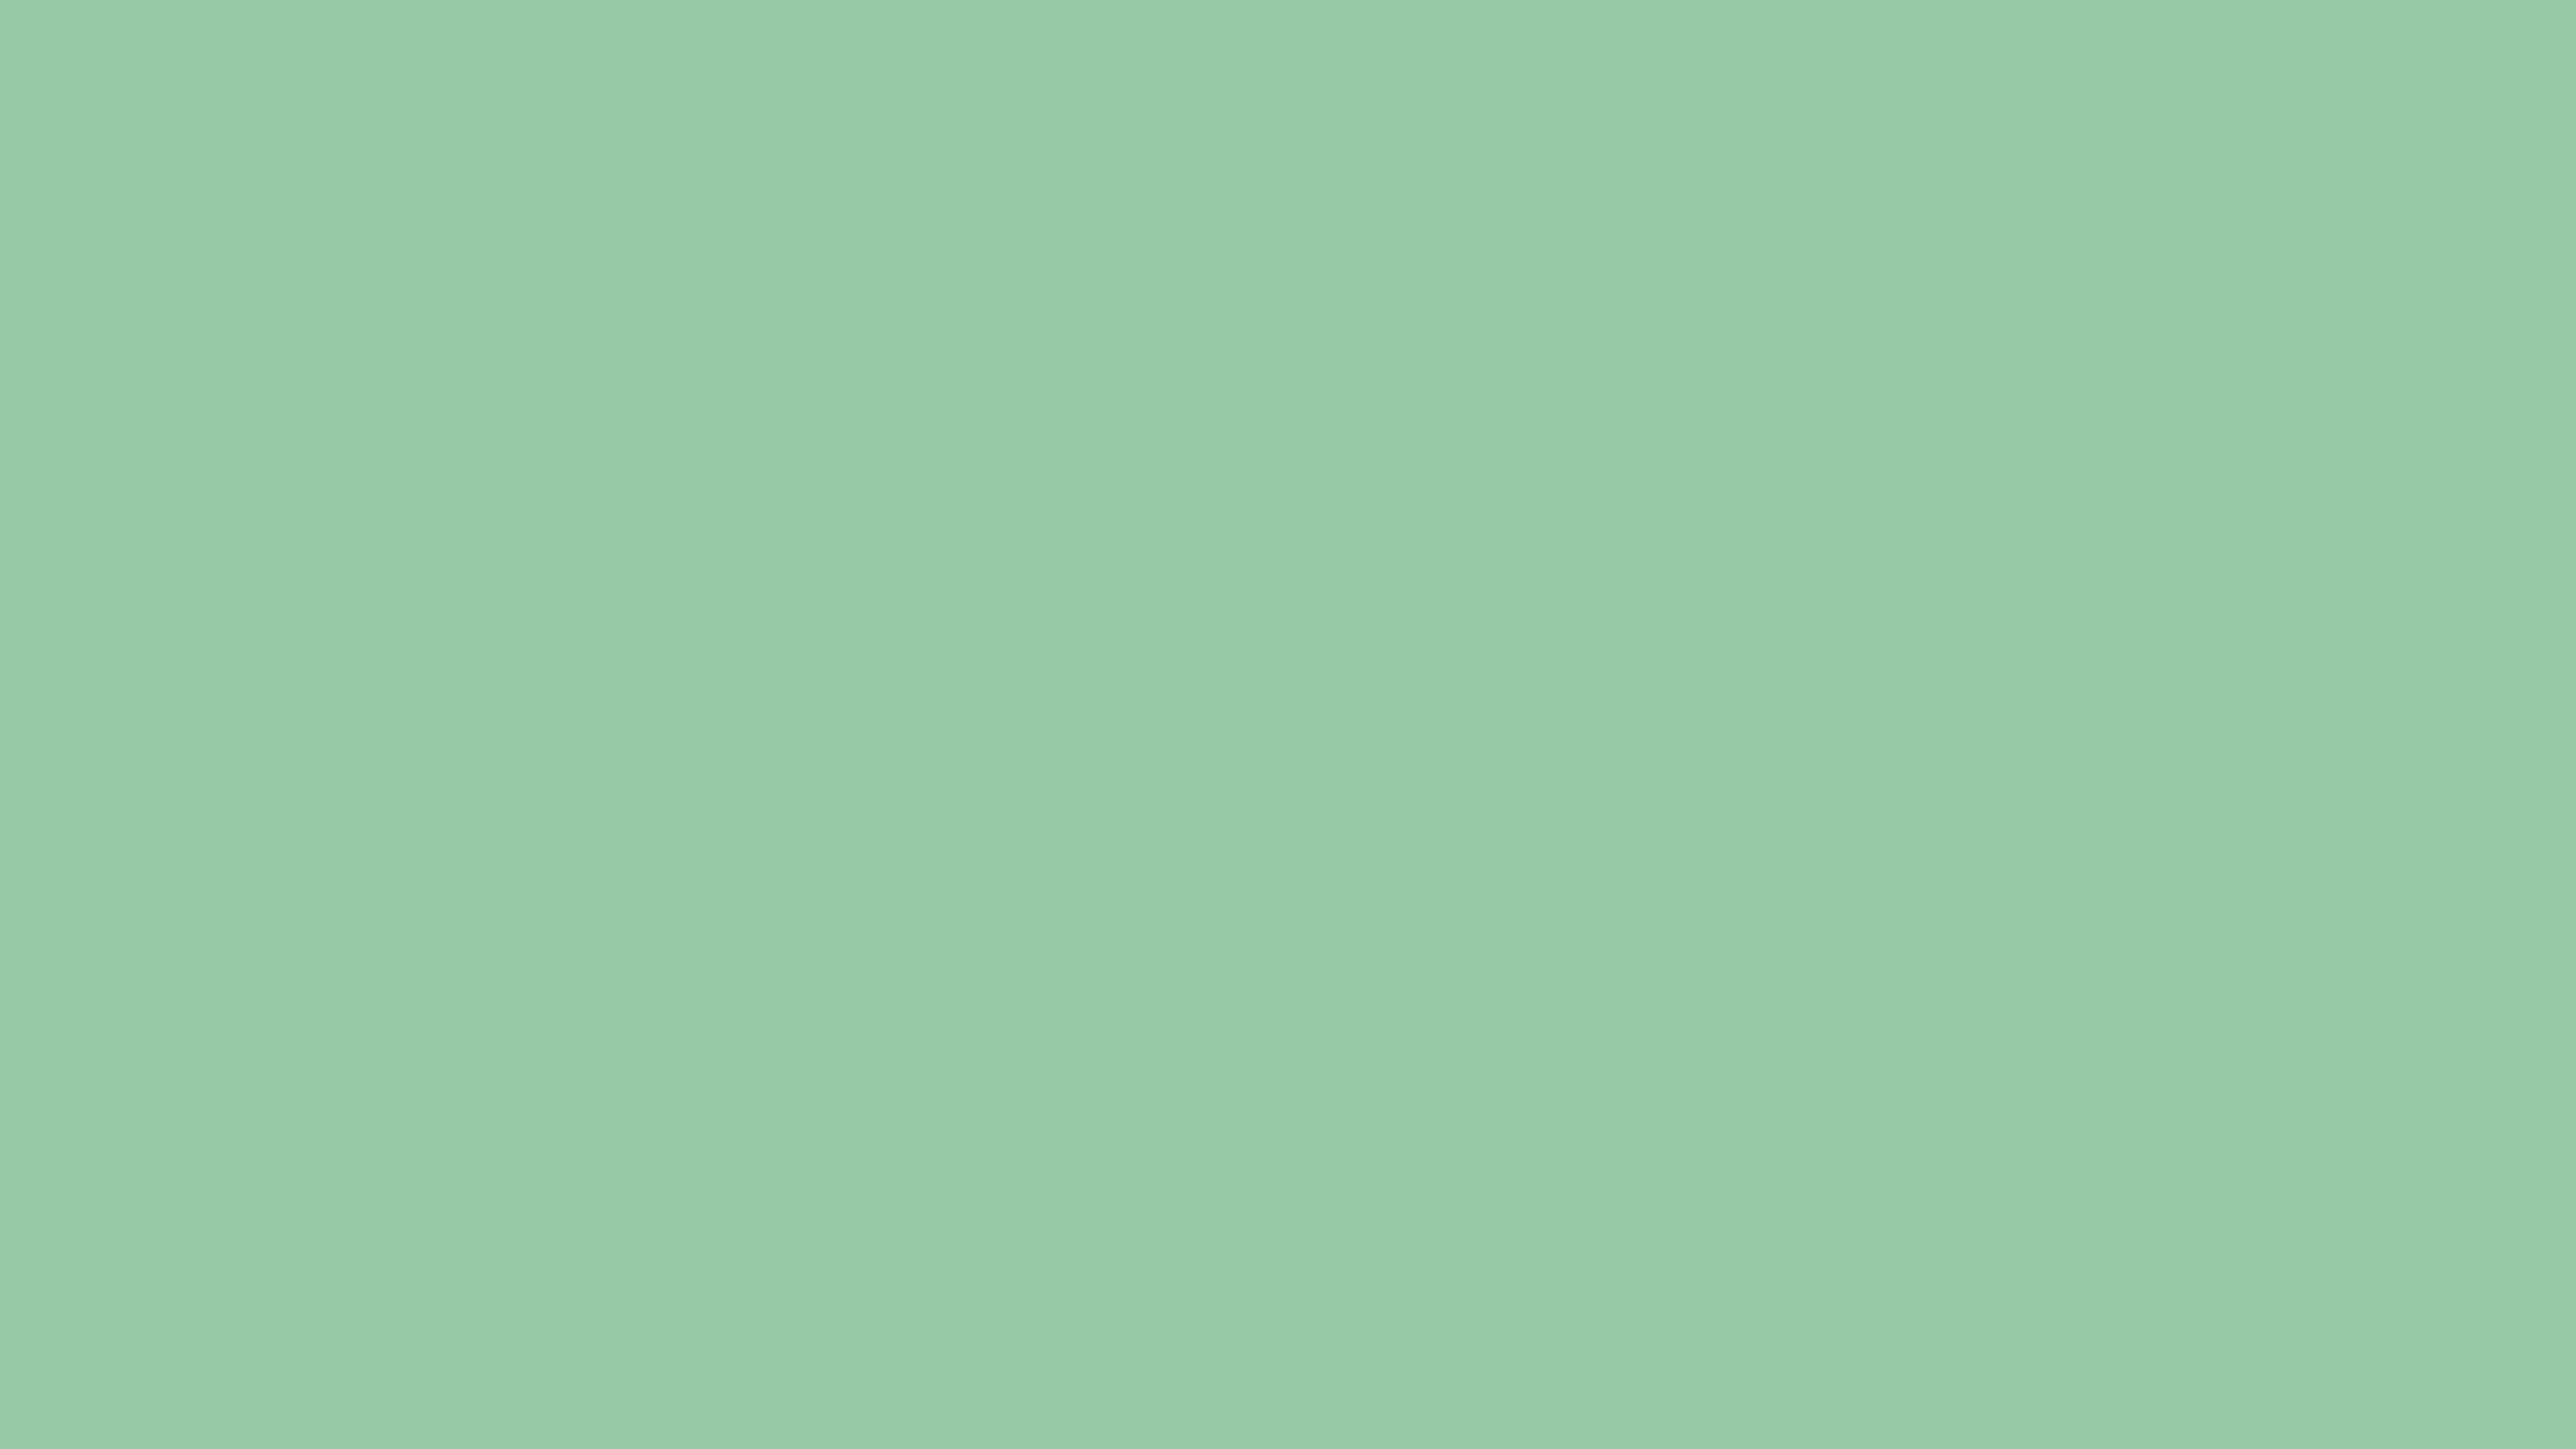 5120x2880 Eton Blue Solid Color Background